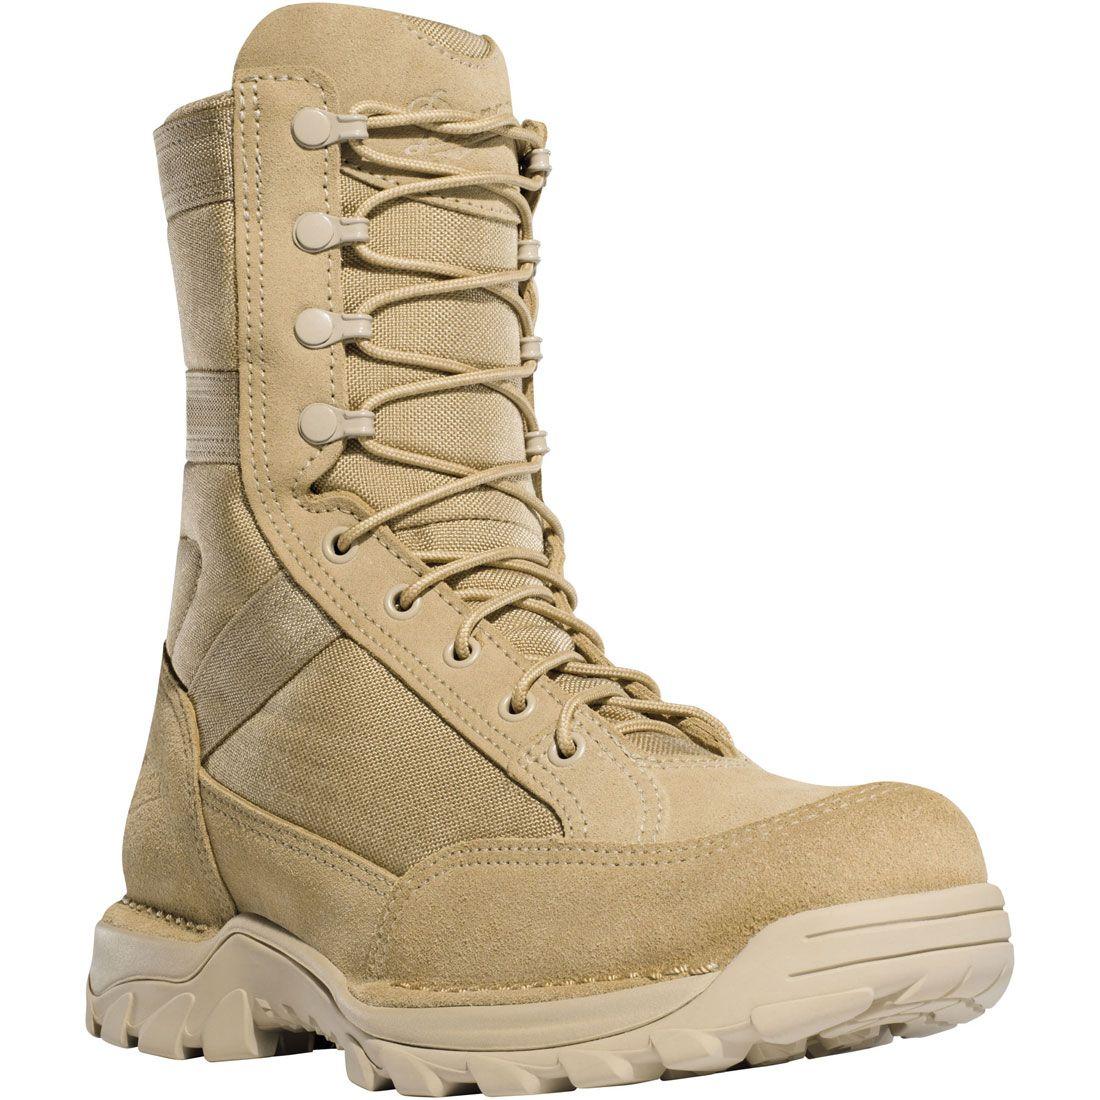 51495 Danner Women S Rivot Gtx Military Boots Tan Danner Boots Boots Army Boots